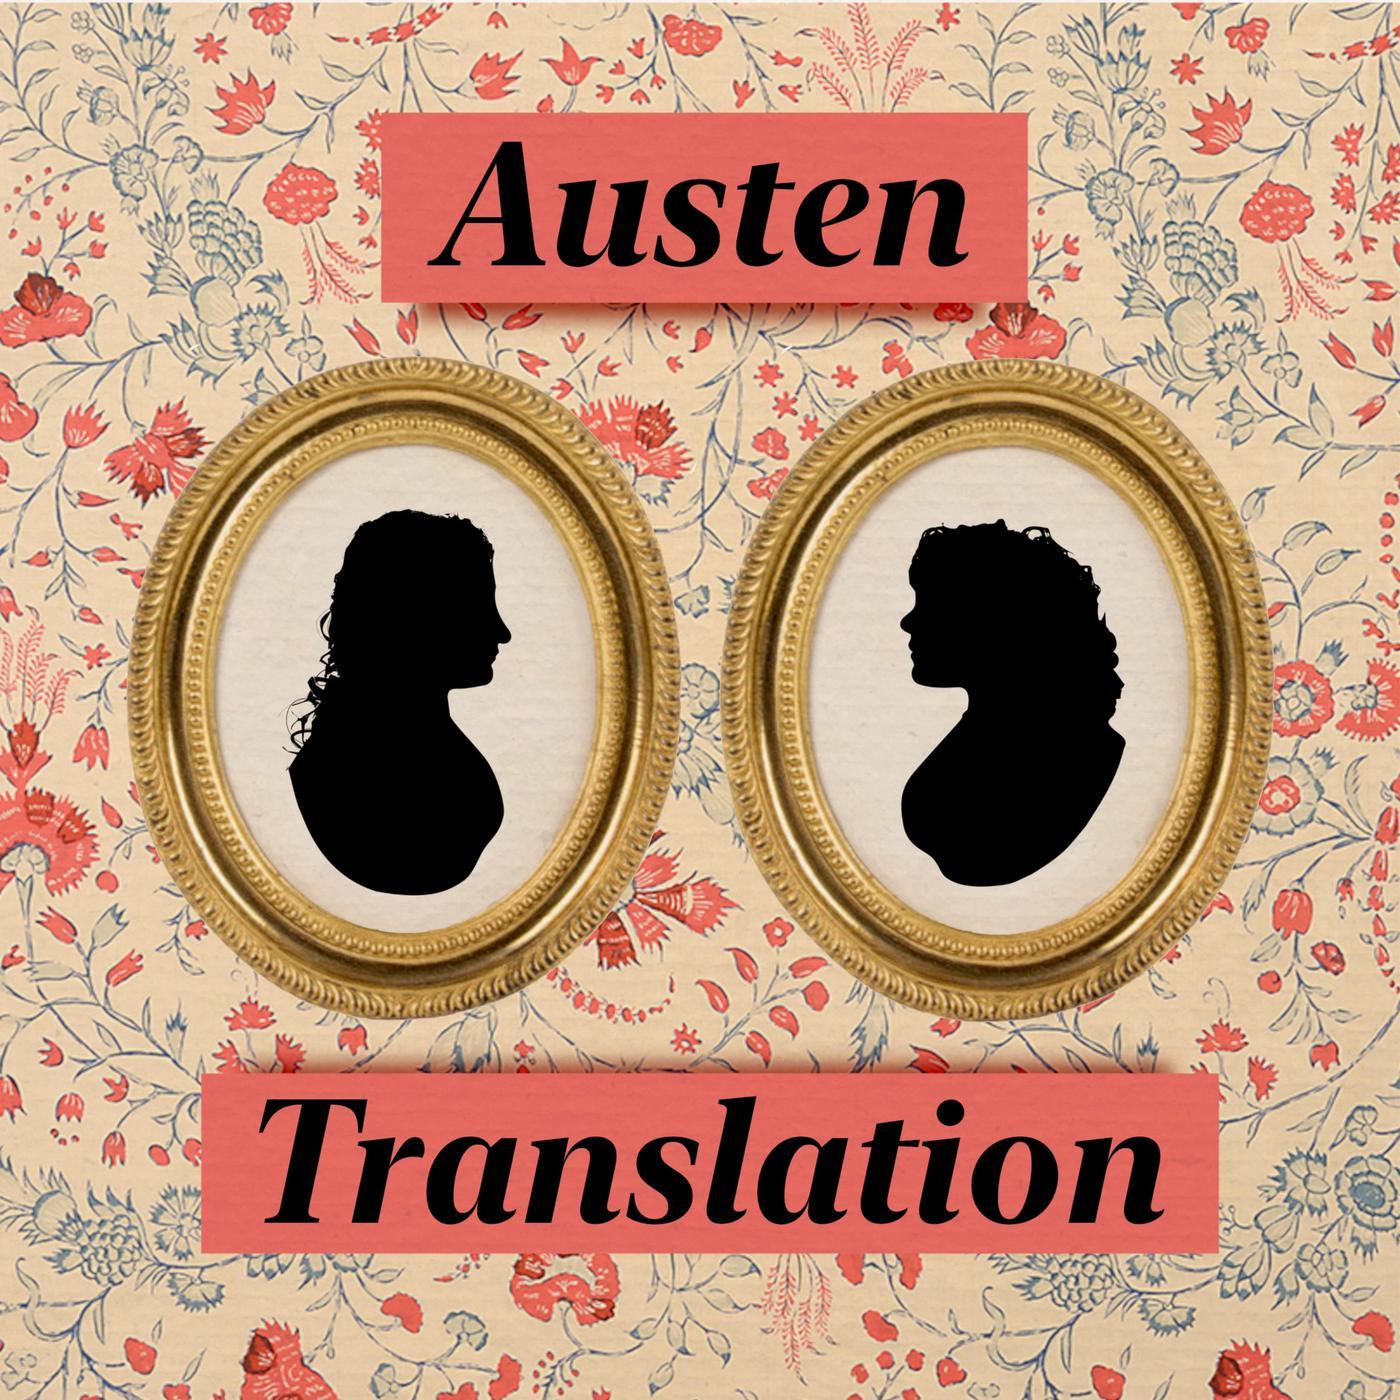 Austen Tranlation